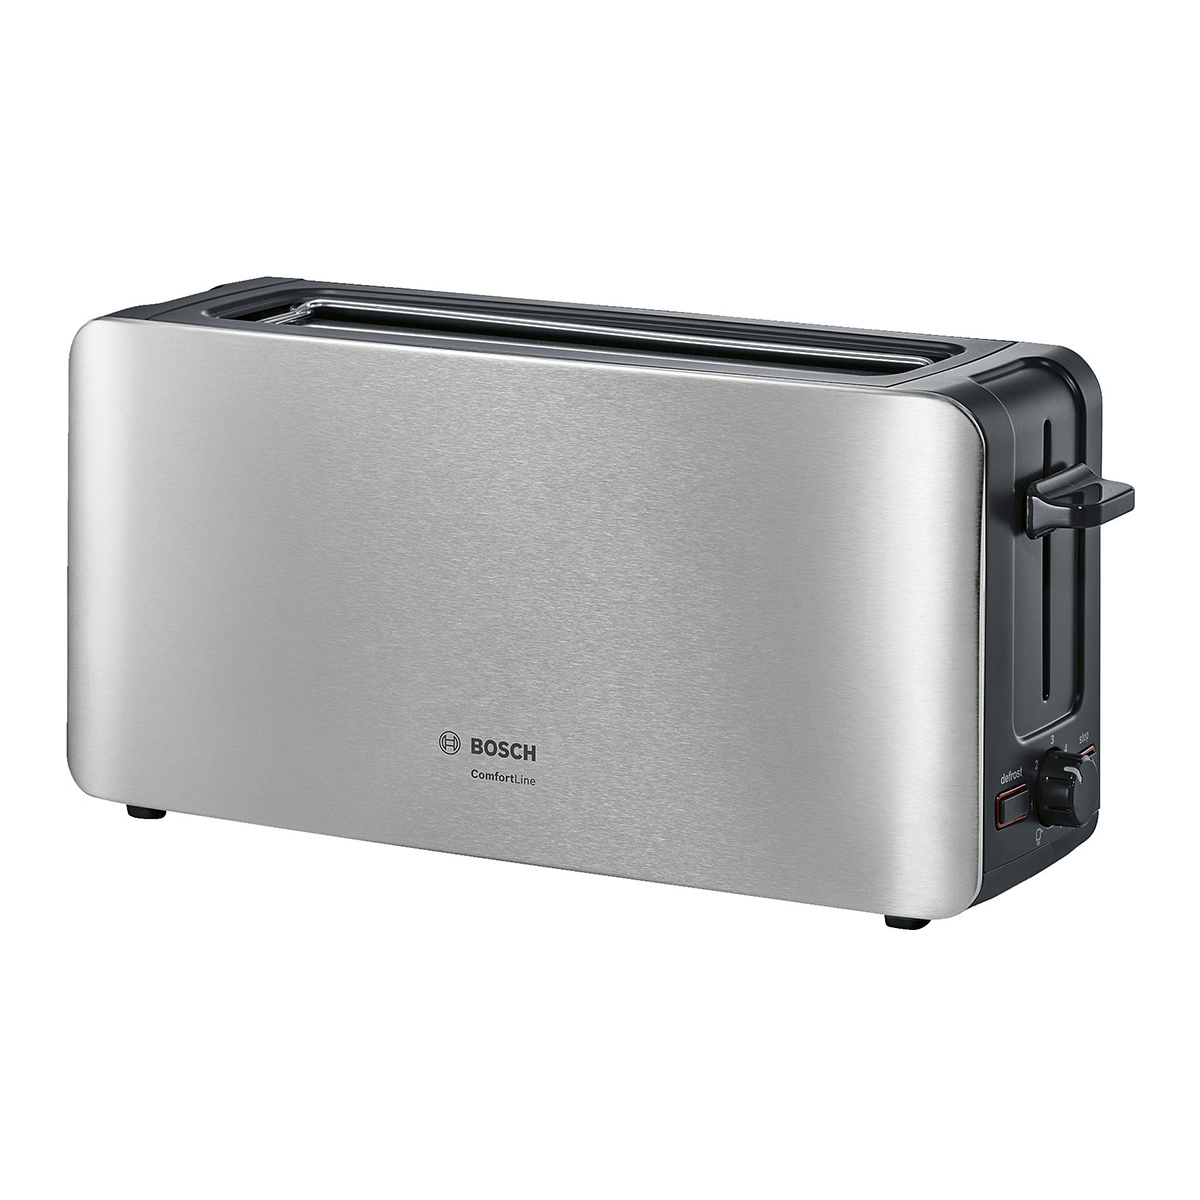 تصویر توستر بوش مدل BOSCH TAT6A004 BOSCH Toaster TAT6A004